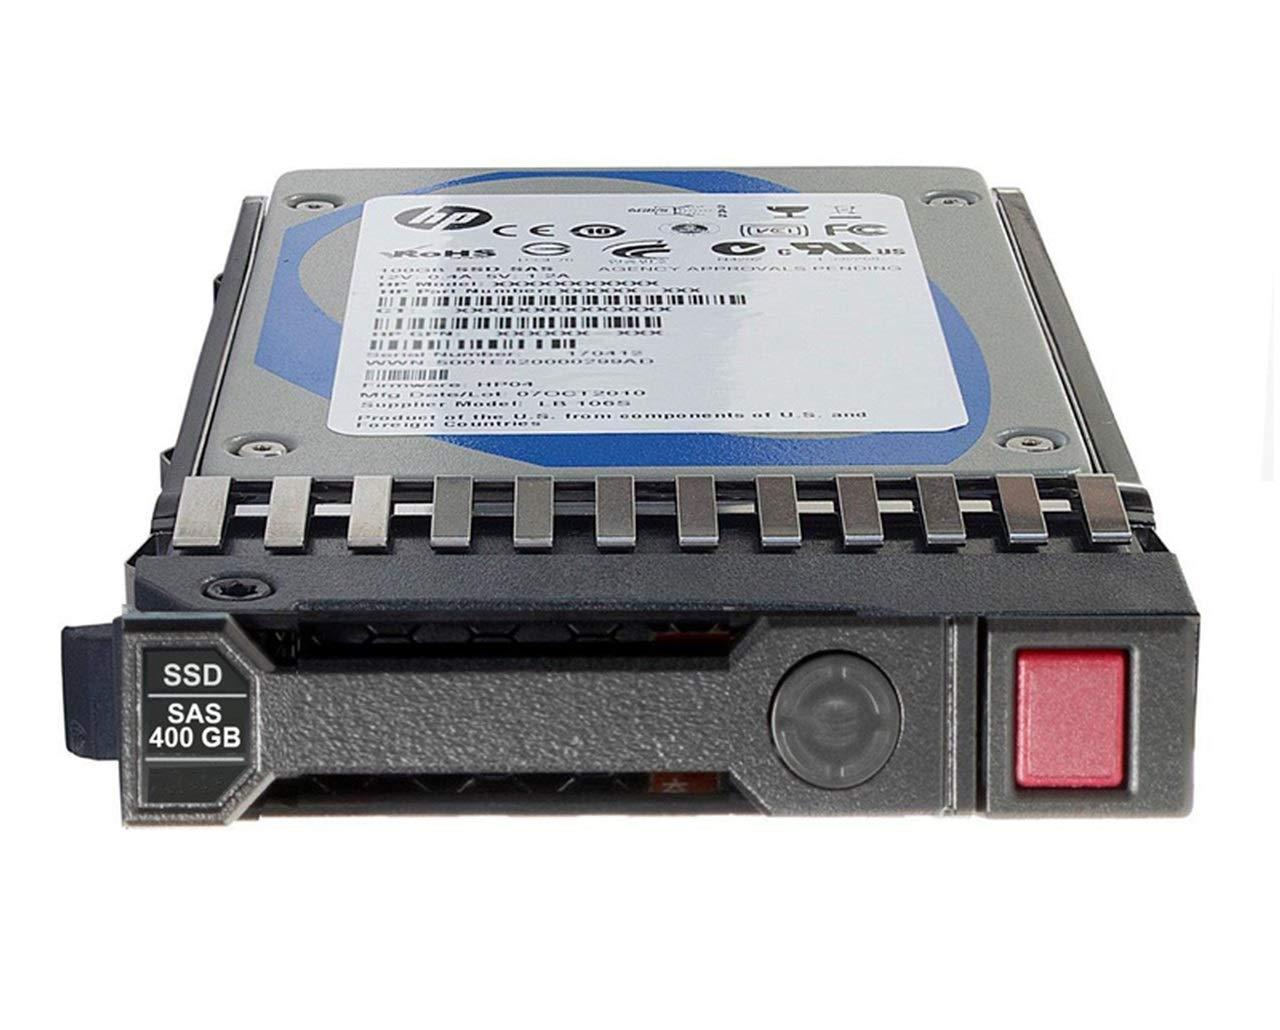 SSD 400GB SAS HP P04525 B21 400GB MU SFF SC DS